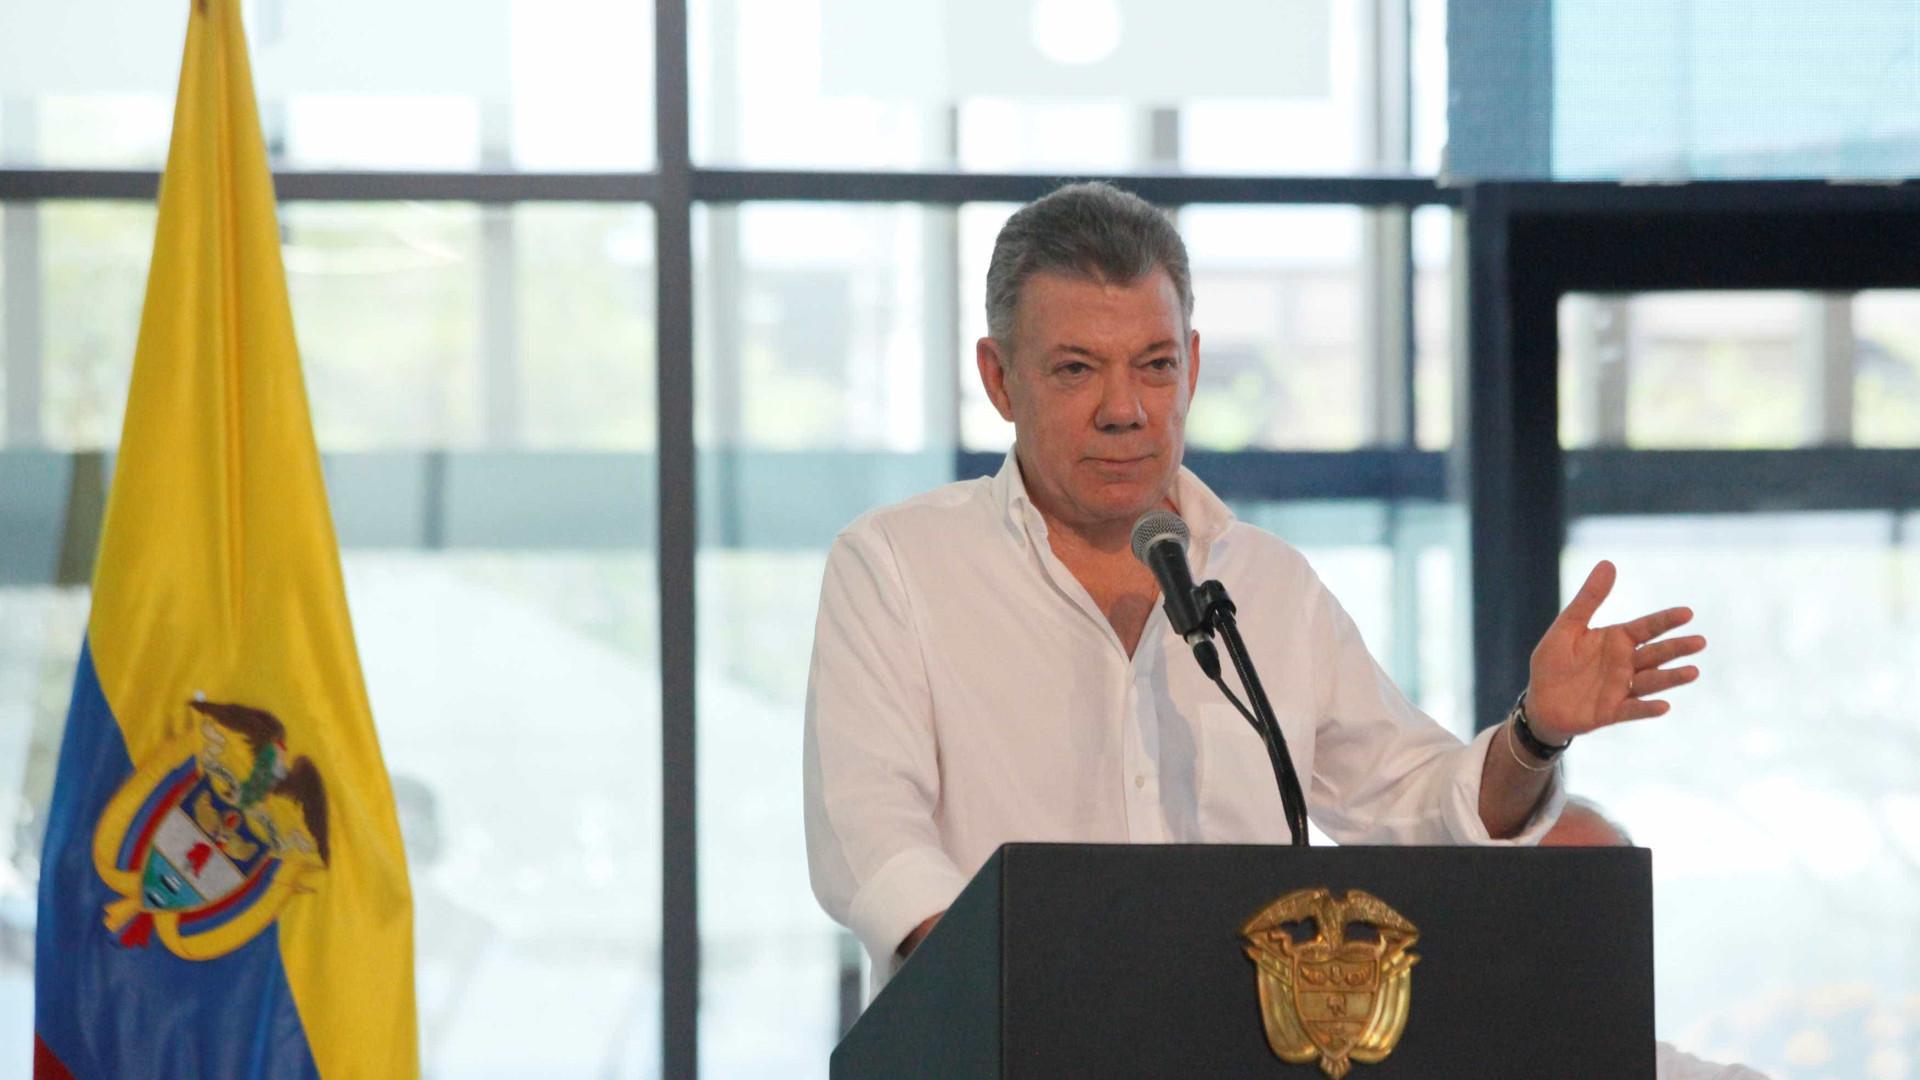 Colômbia reconhece Palestina, mas novo governo revisará